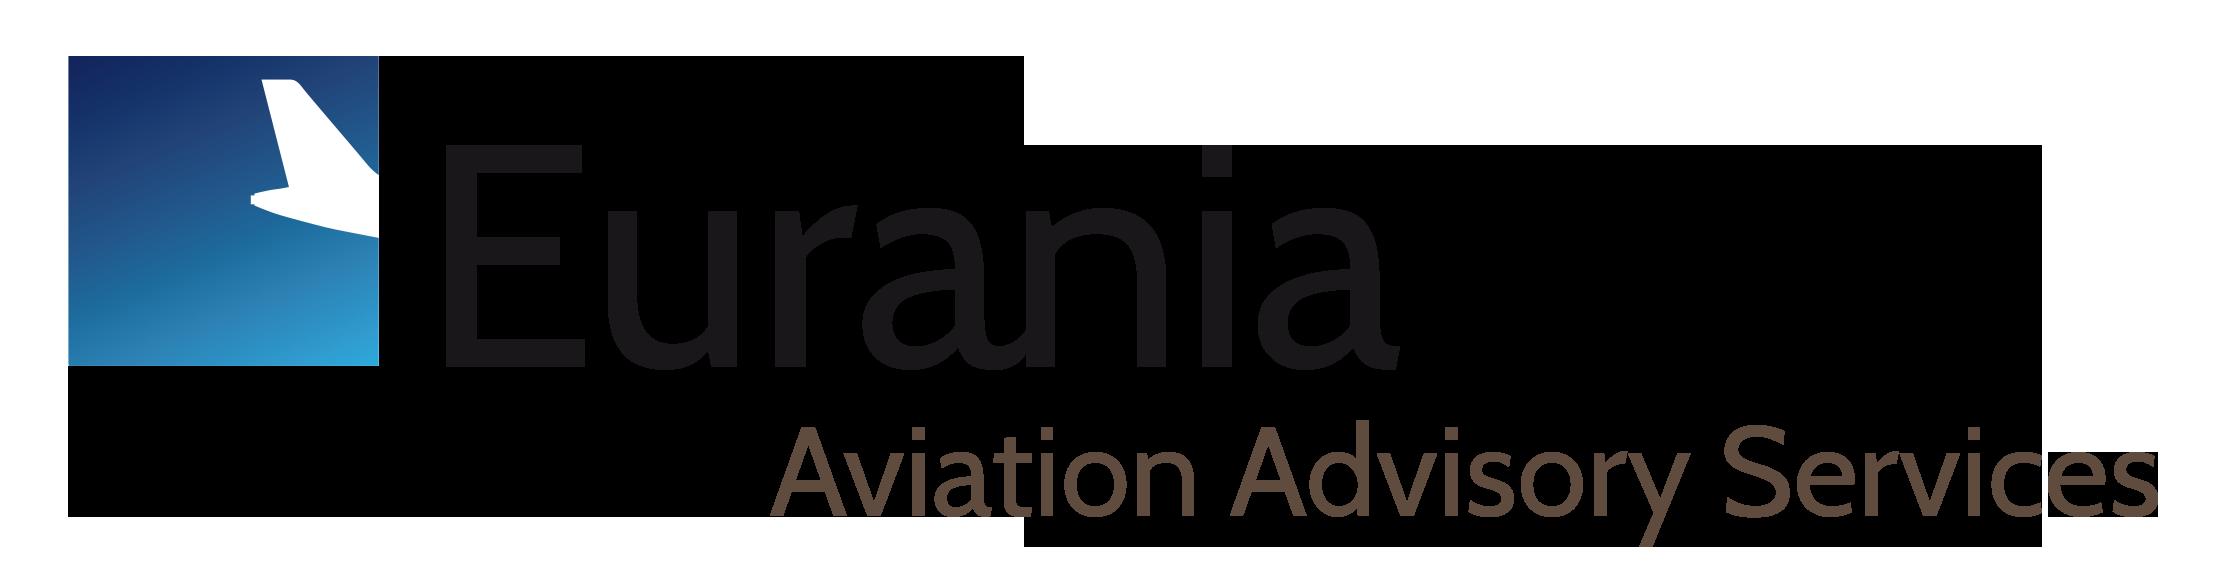 Eurania Services